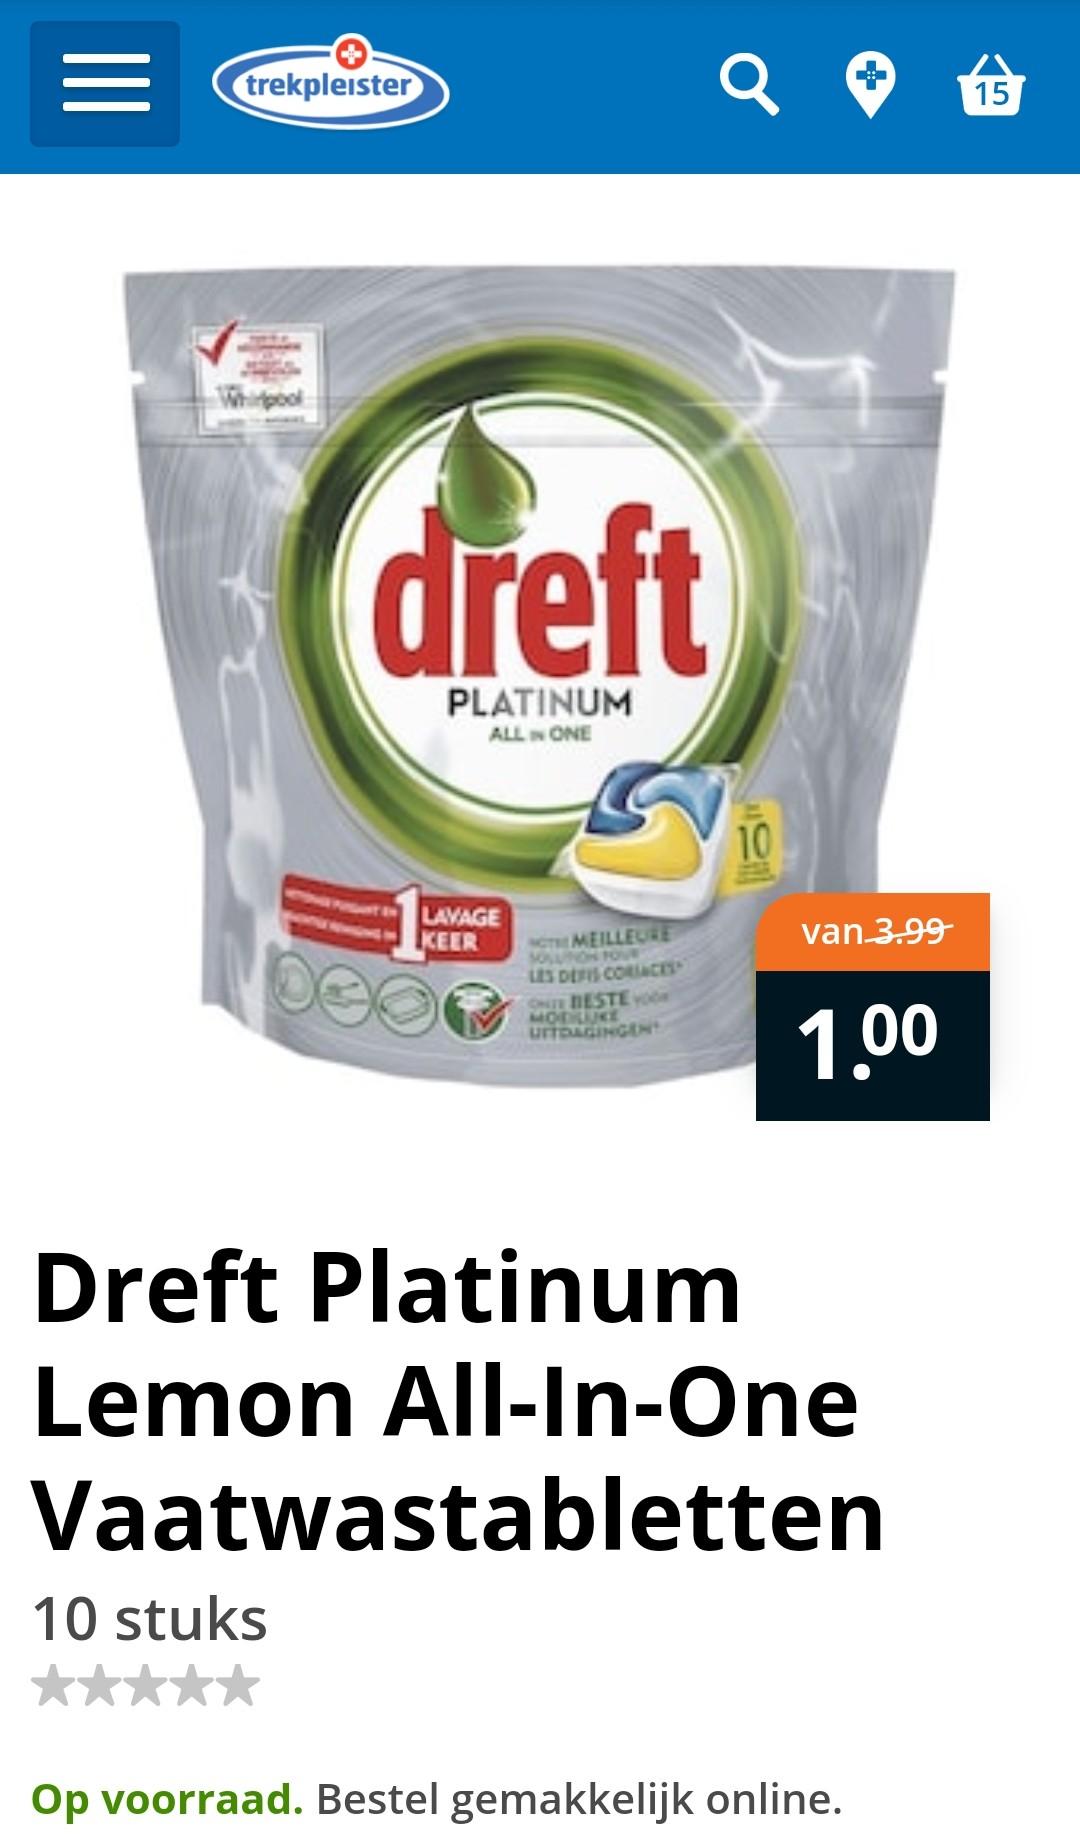 Trekpleister: Dreft Platinum Lemon All-In-One Vaatwastabletten